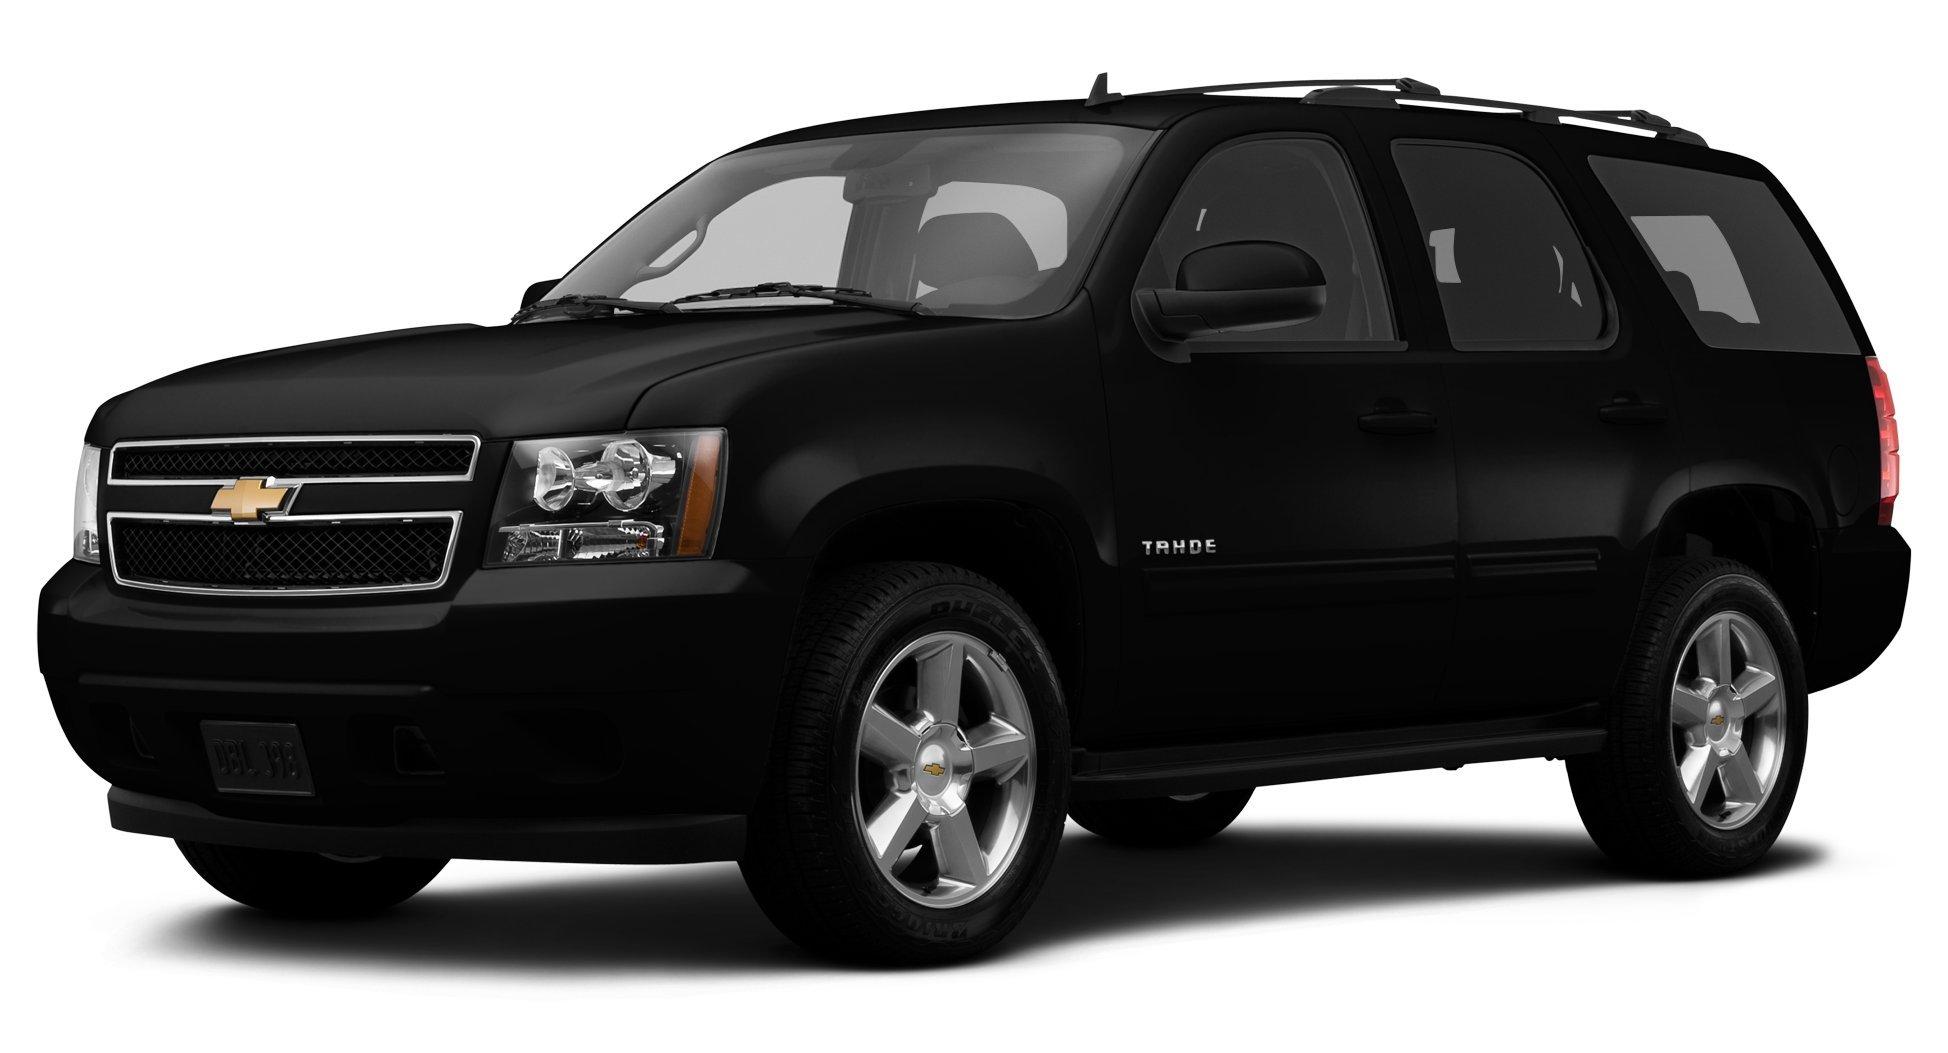 9 Chevrolet Tahoe | 2014 chevrolet tahoe